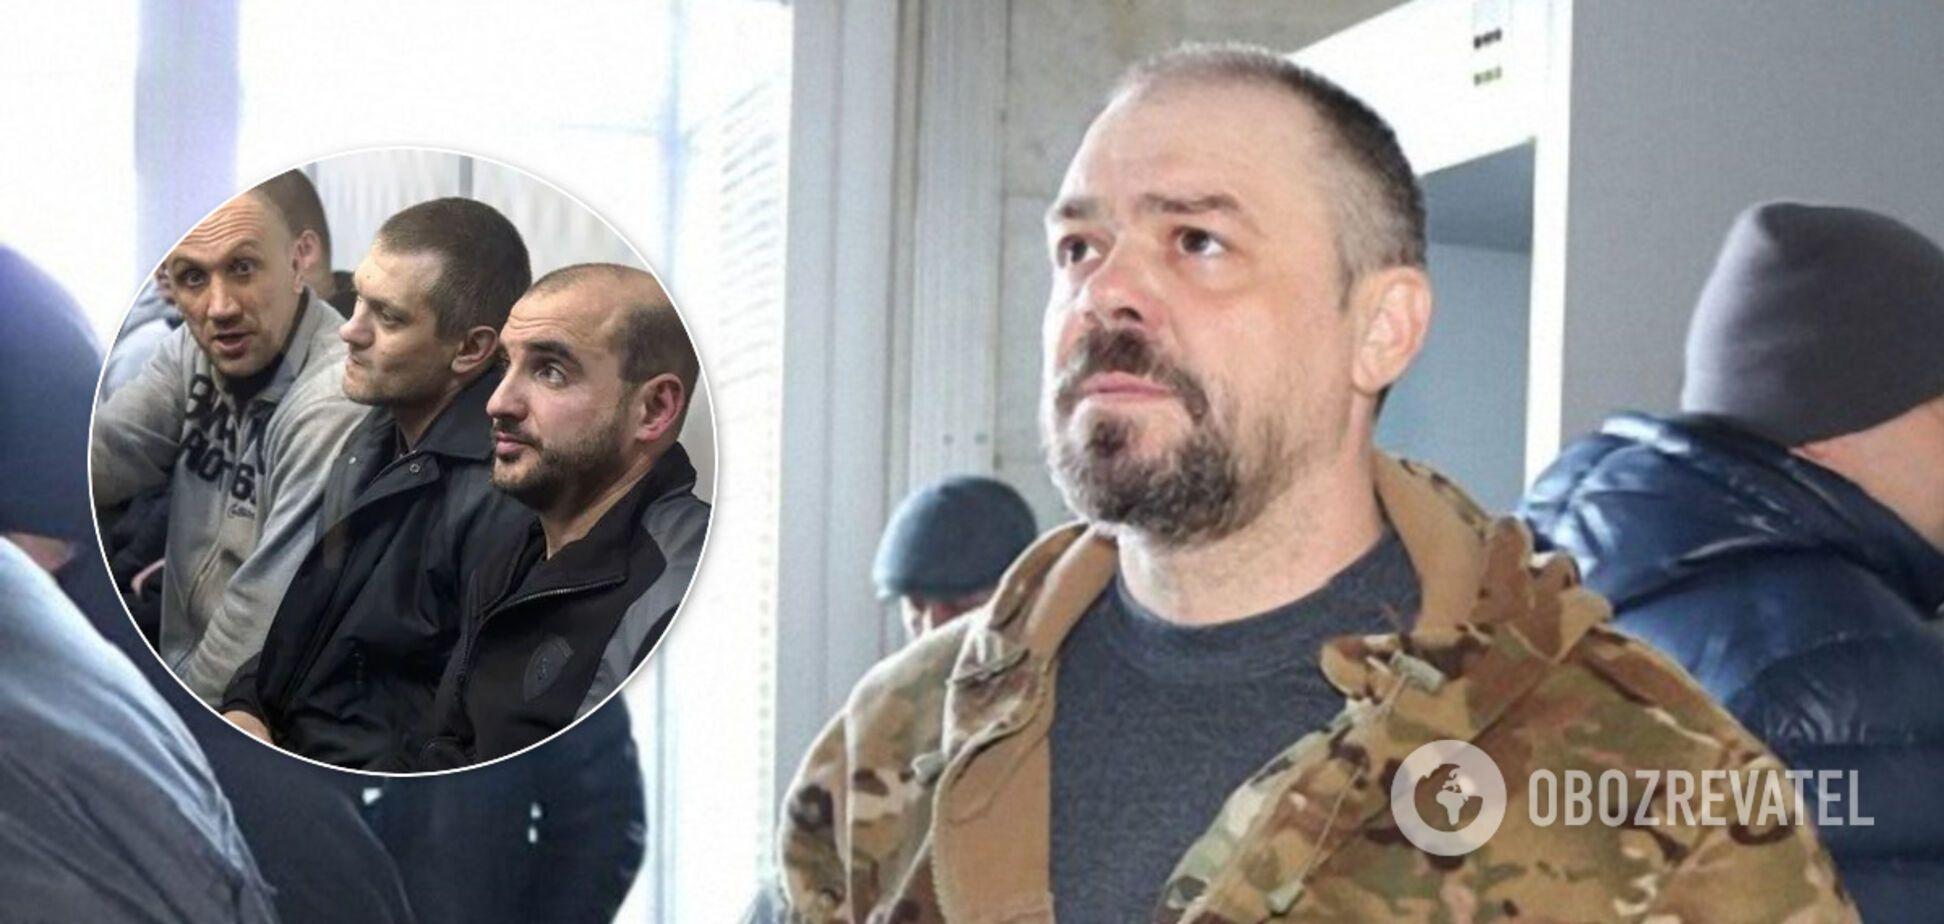 Суд отпустил на море одного из фигурантов дела об убийстве 'Сармата'